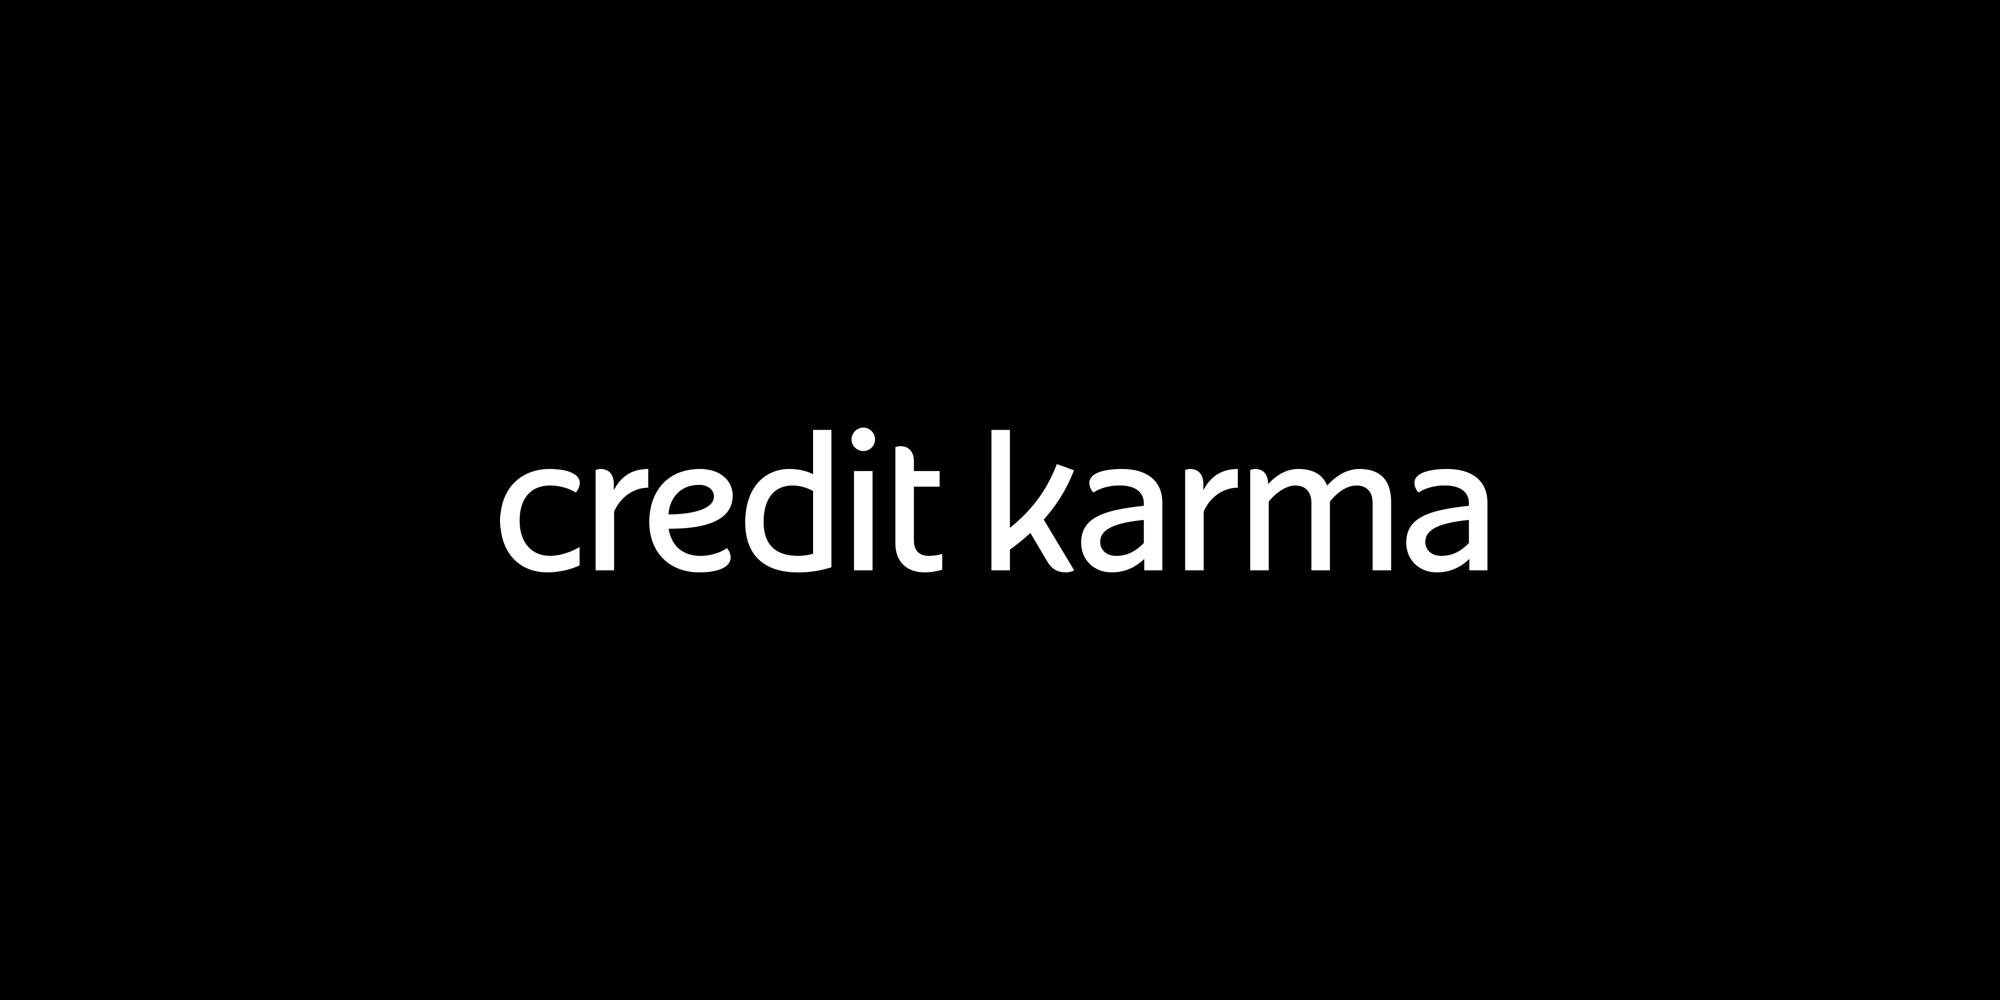 Creditkarma_logo